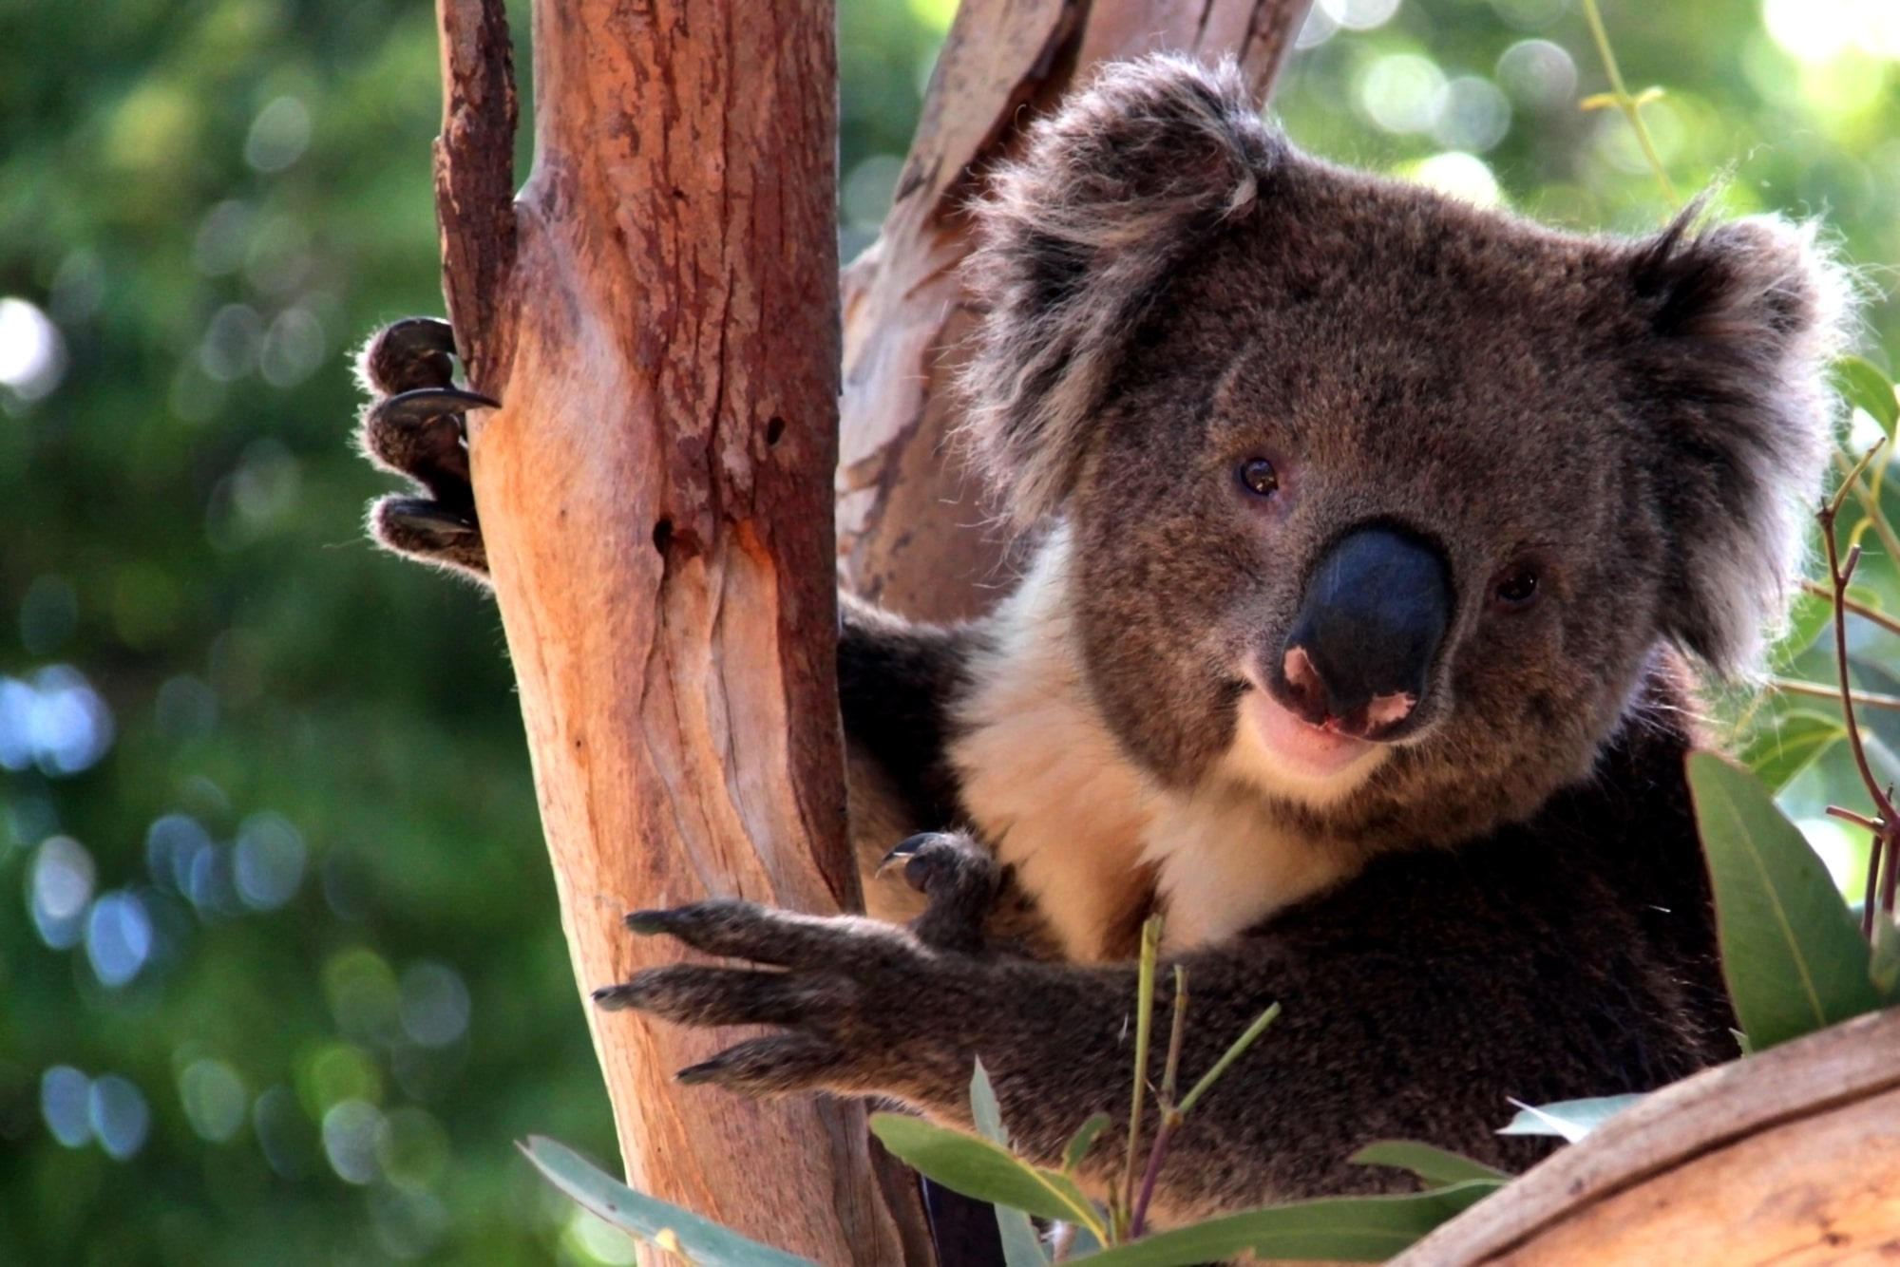 Victorian Koala in Eucalyptus Tree, Adelaide, Australia